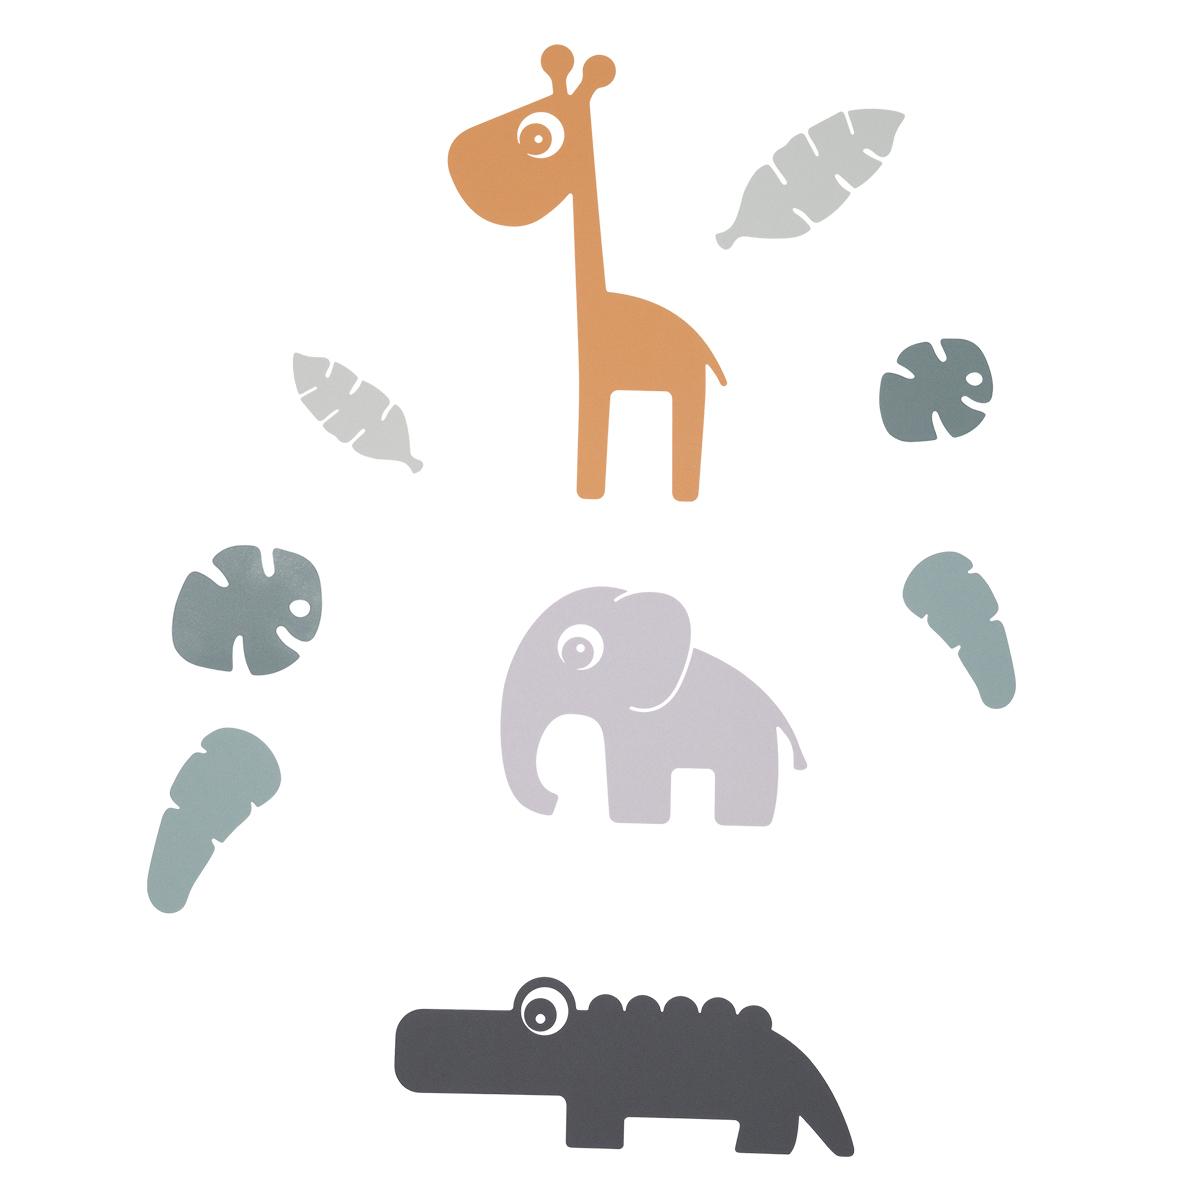 Sticker Stickers - Tiny Tropics Stickers - Tiny Tropics